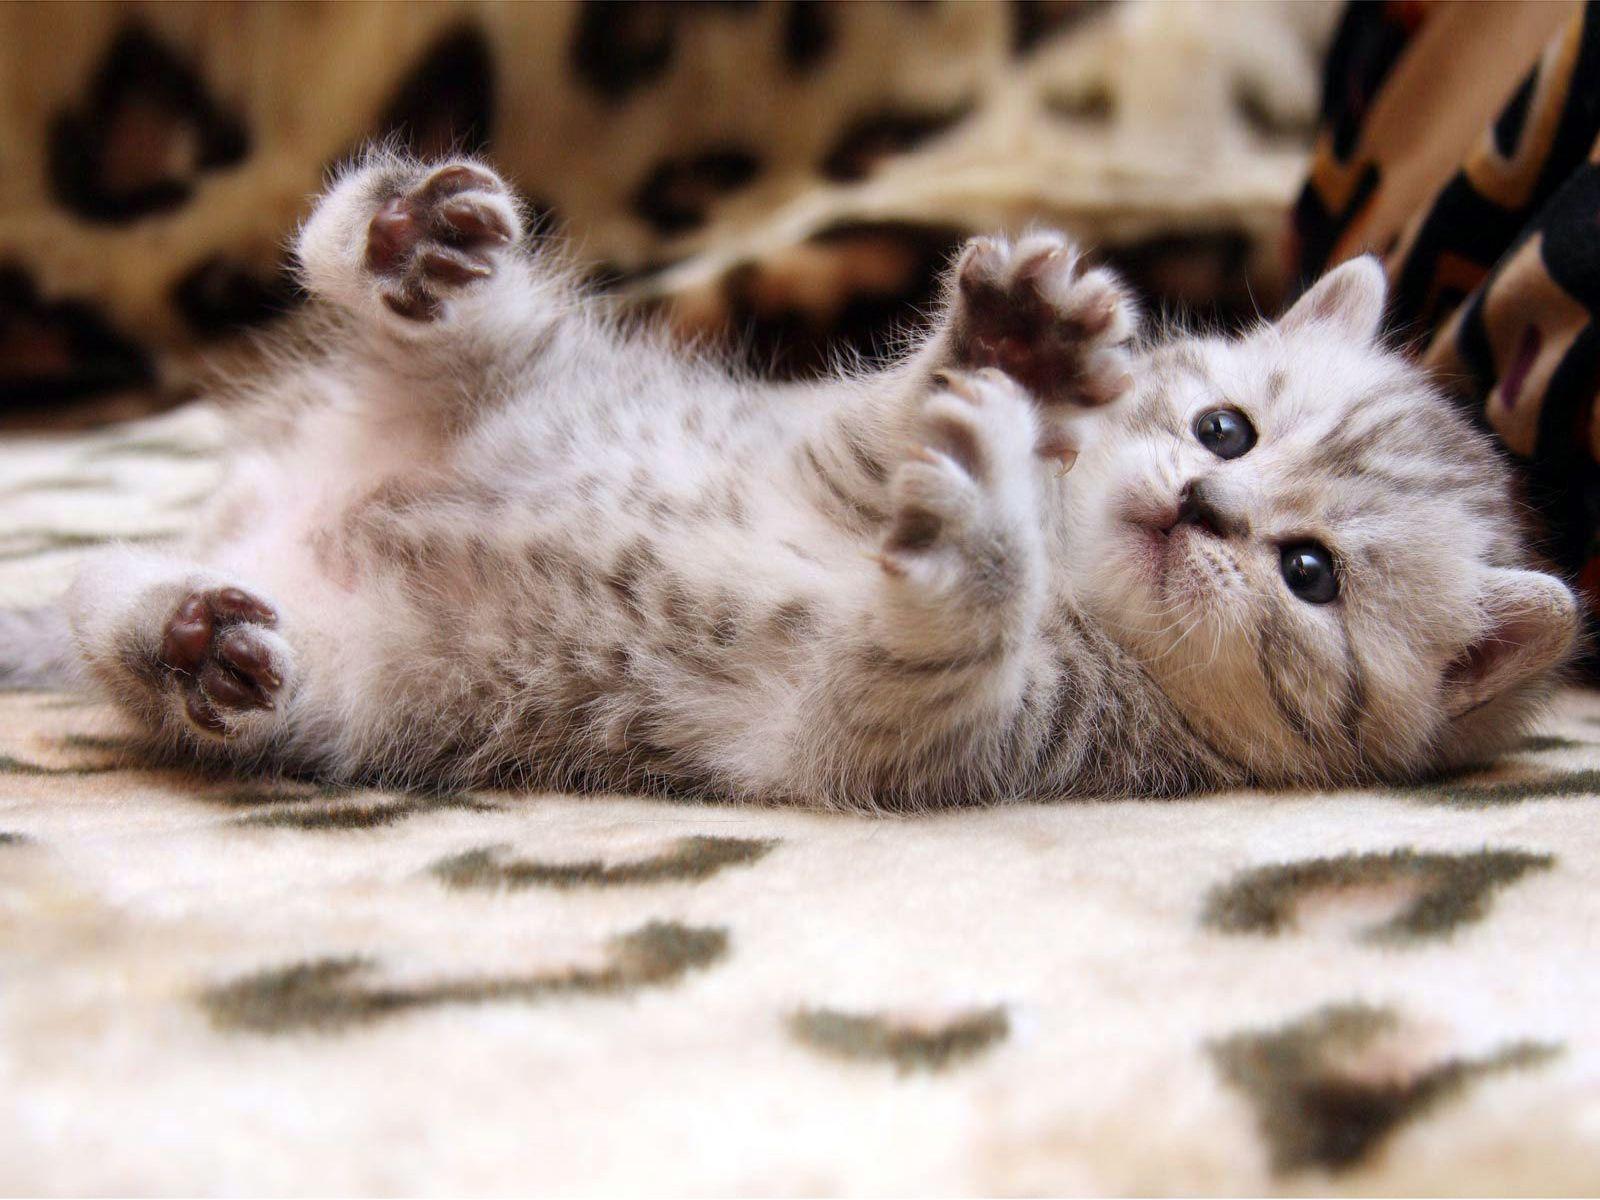 baby cat wallpapers - wallpaper cave